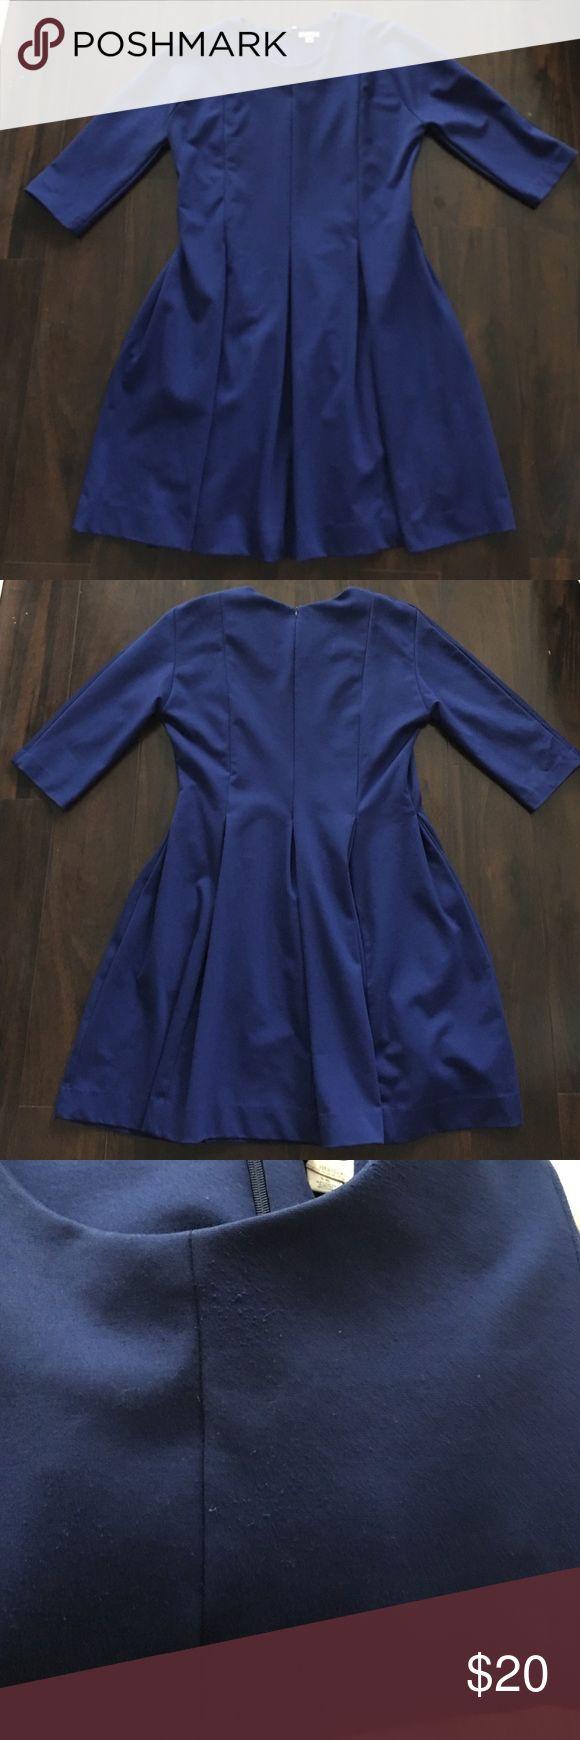 Gap Cobalt Dress w/ pockets. Gap Cobalt Dress w/ pockets. Shows signs of wear-peeling. Dresses